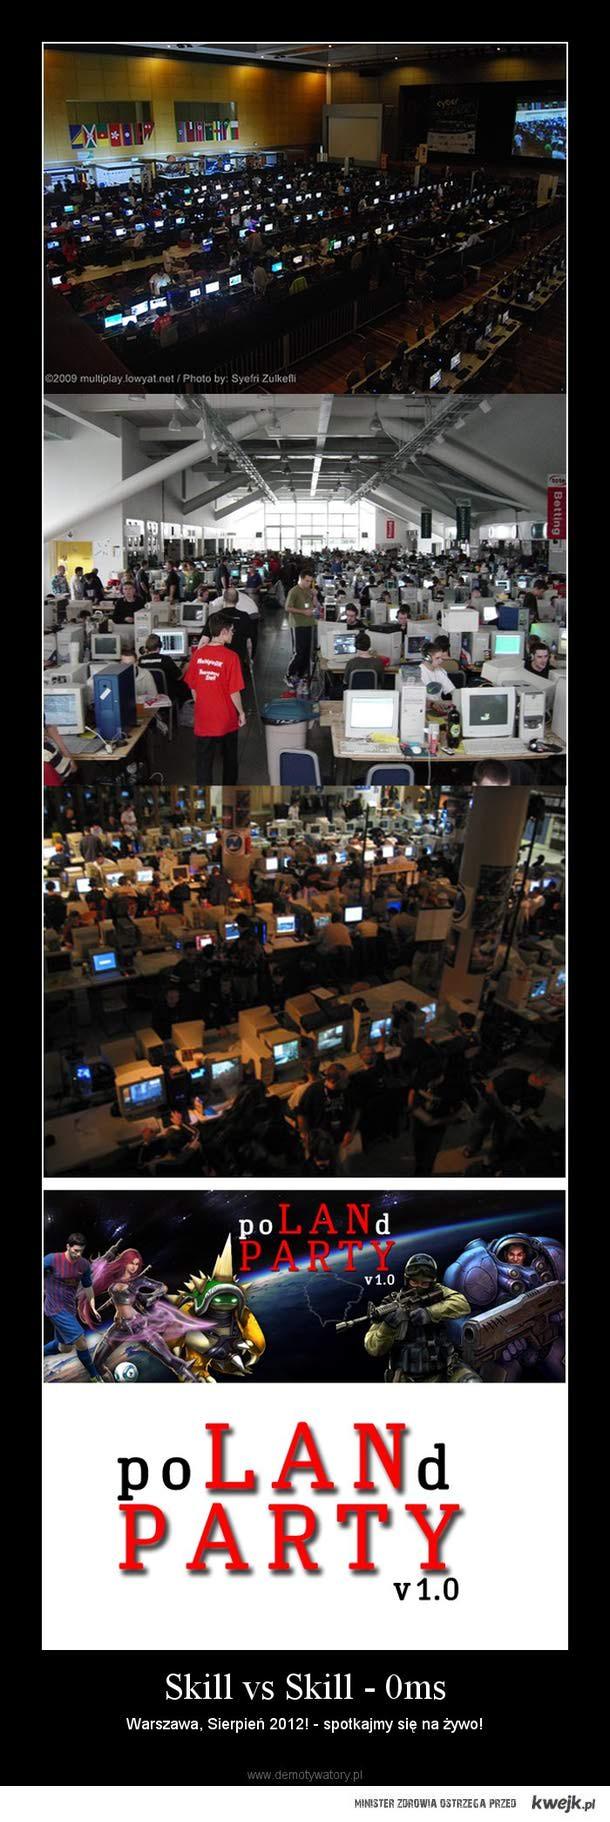 poLANd PARTY v. 1.0 2012